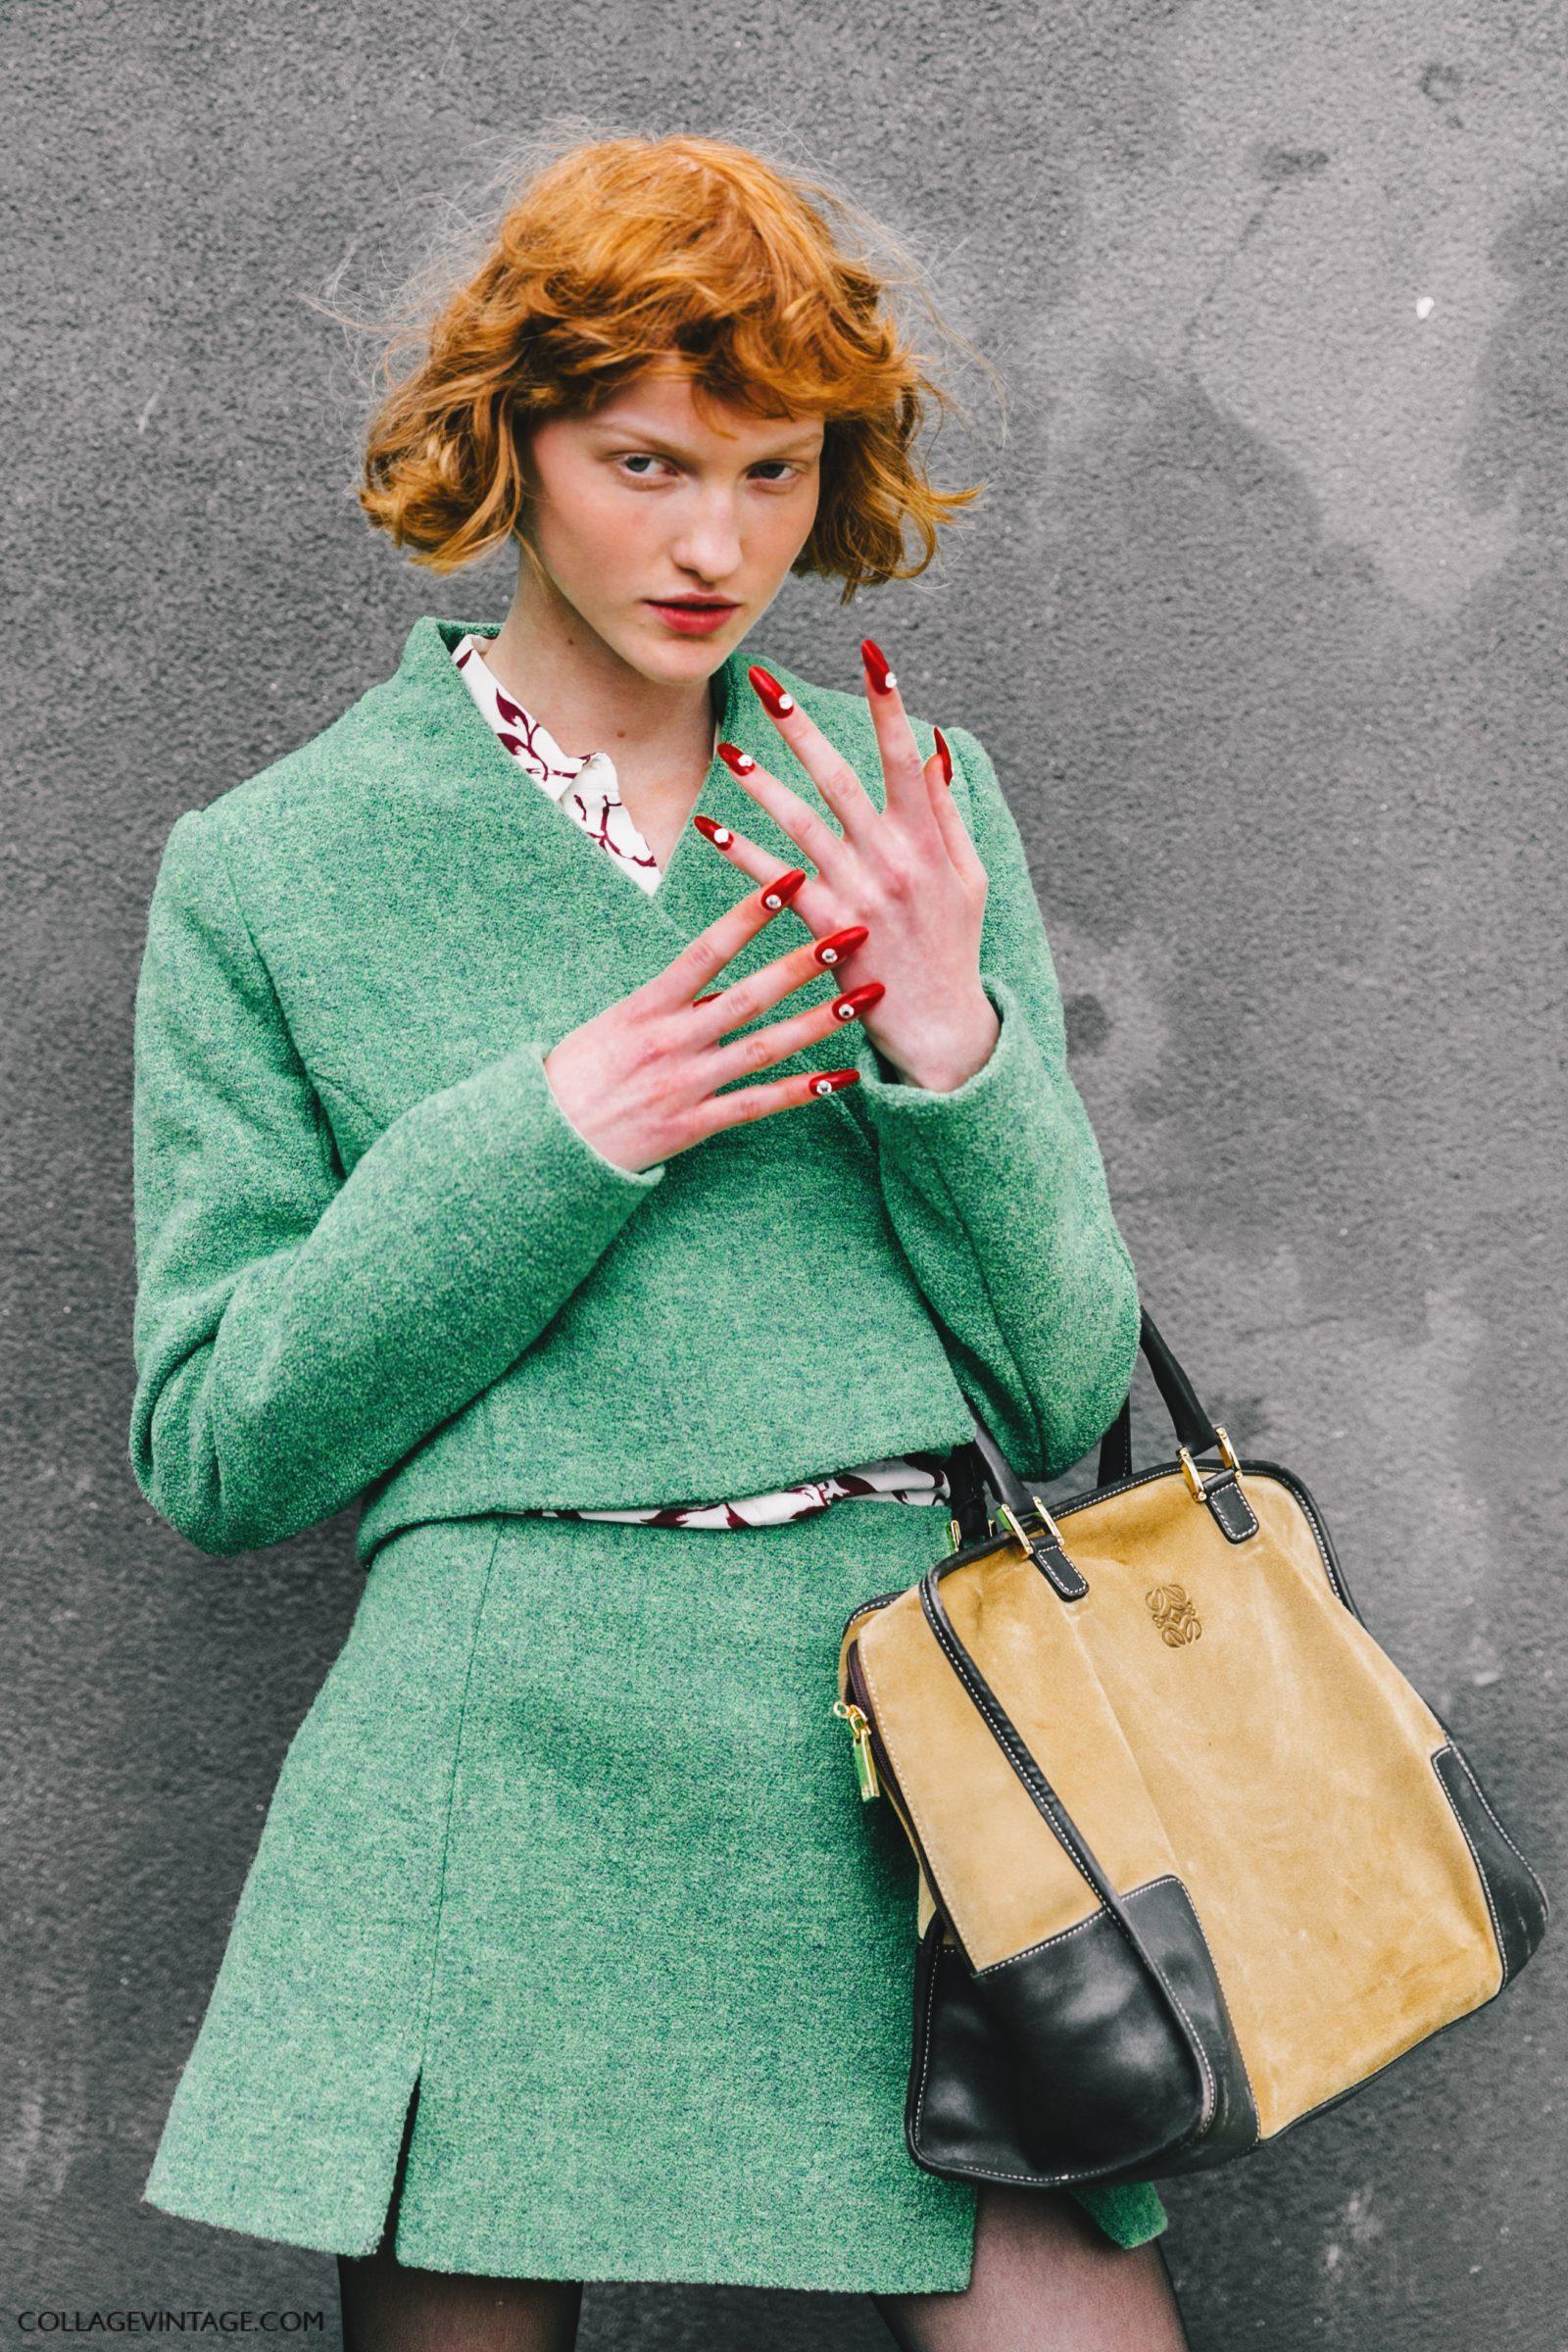 pfw-paris_fashion_week_ss17-street_style-outfits-collage_vintage-valentino-balenciaga-celine-56